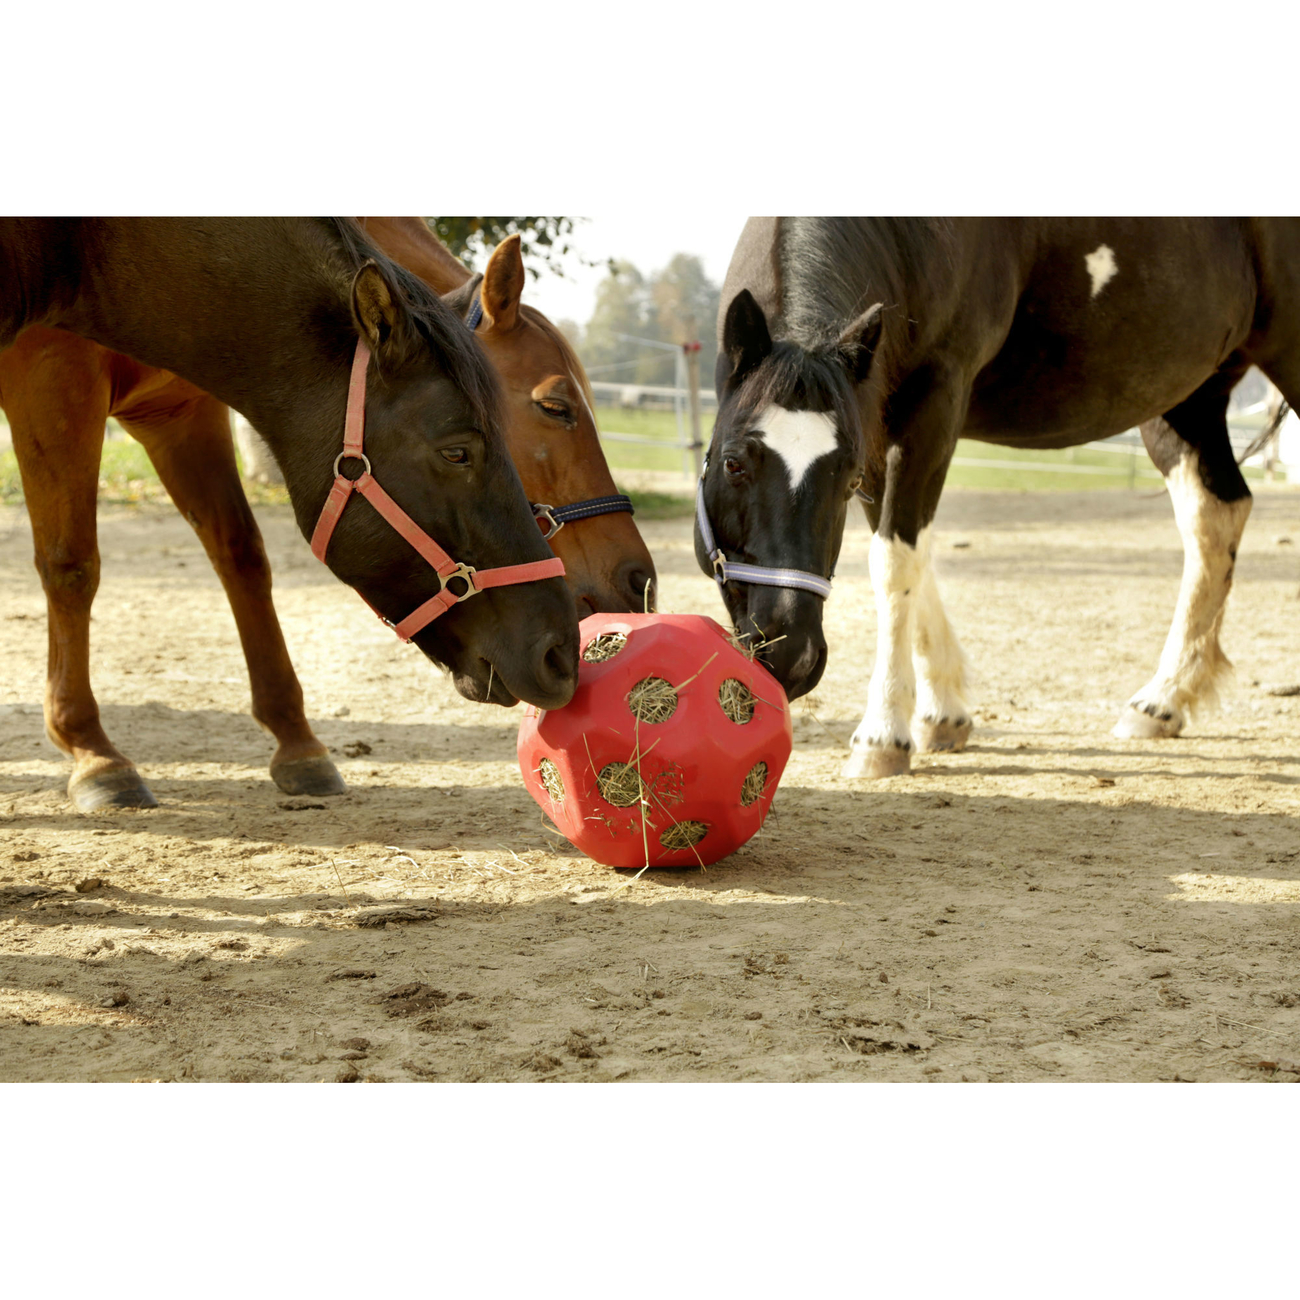 Kerbl HeuBoy Futterspielball für Pferde Bild 2